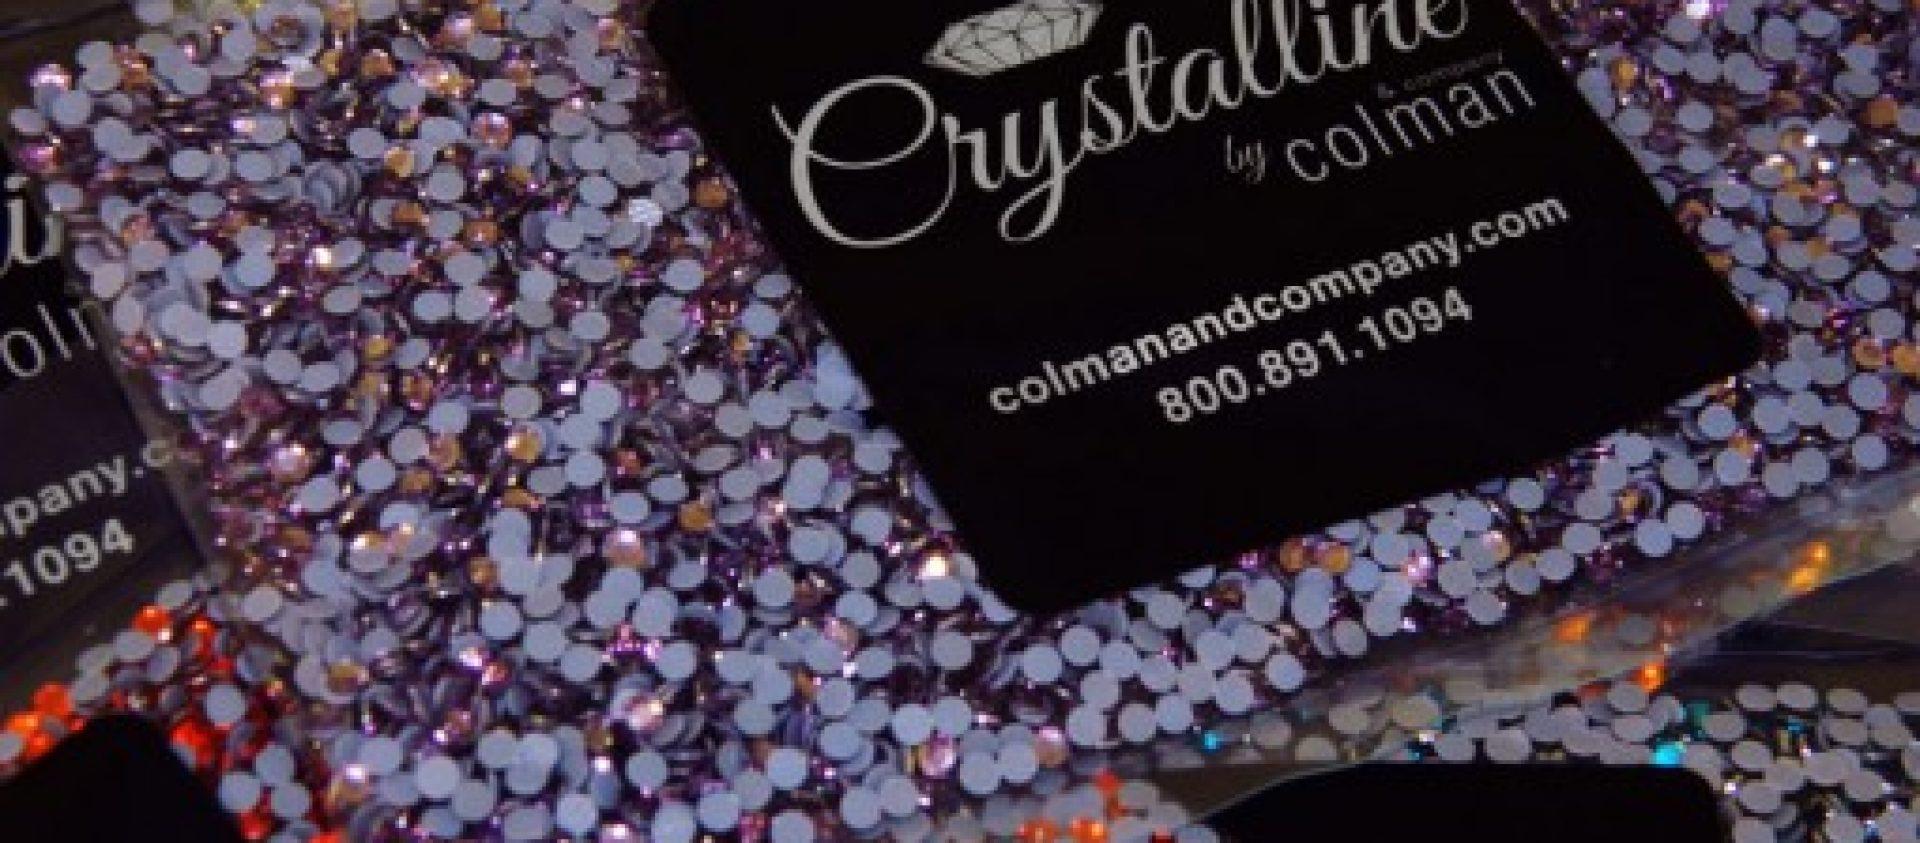 crystalline-hotfix-rhinestones-purple-bag-510x3005